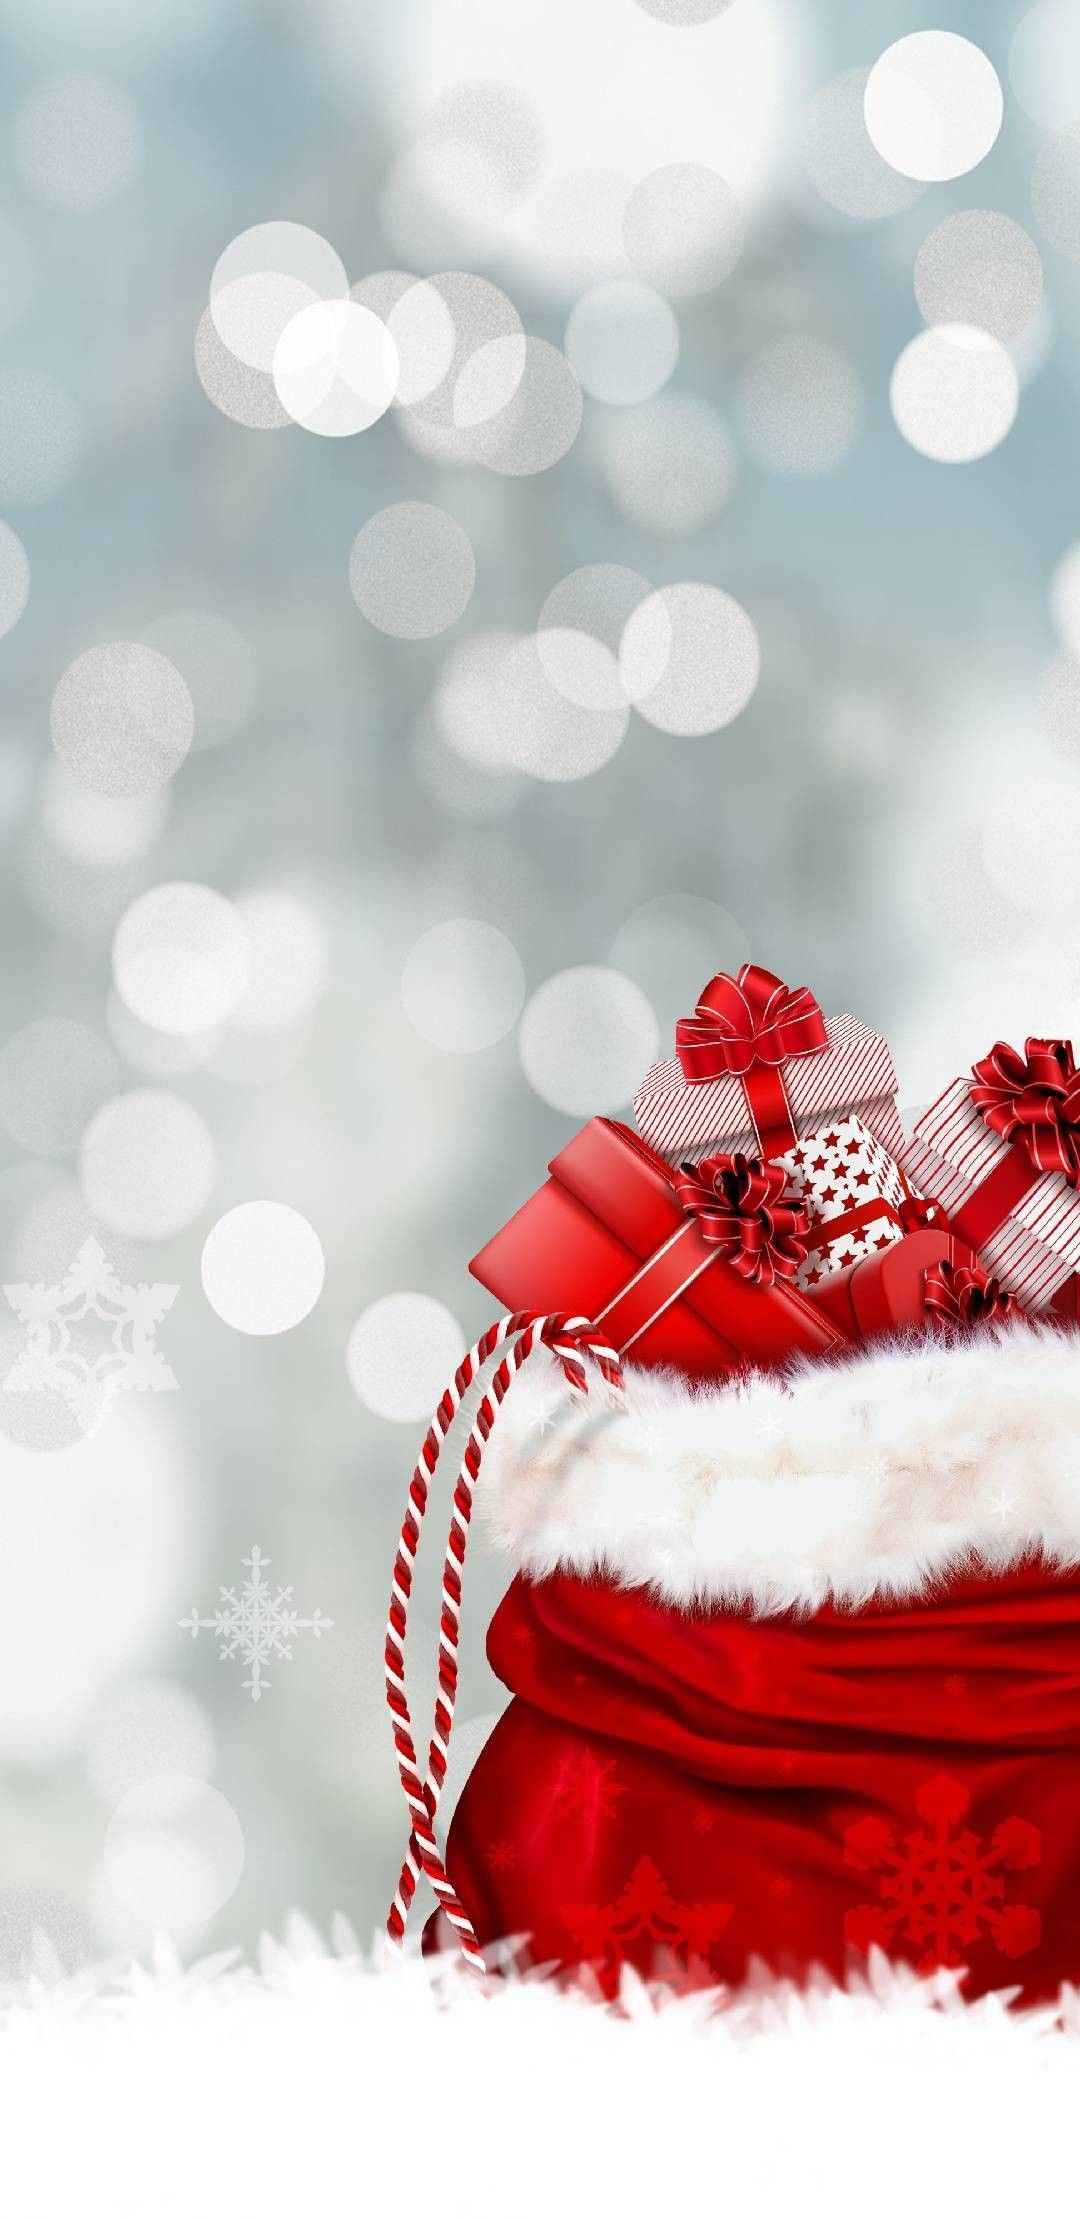 Pin by Pennie Lobin on Christmas | Pinterest | Christmas, Christmas ...